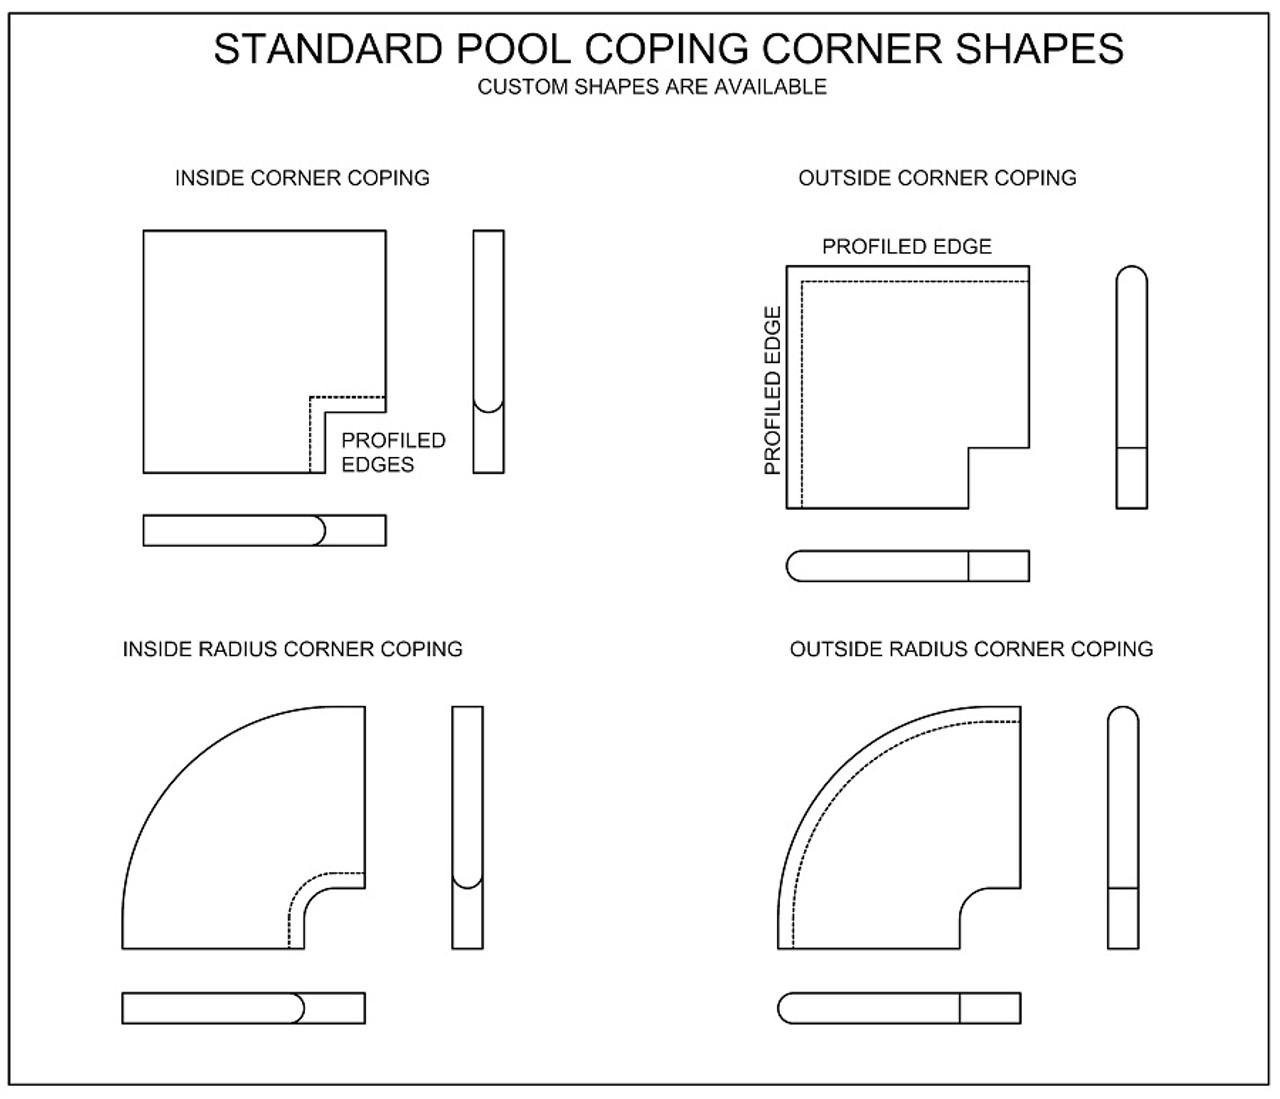 Corner coping shapes